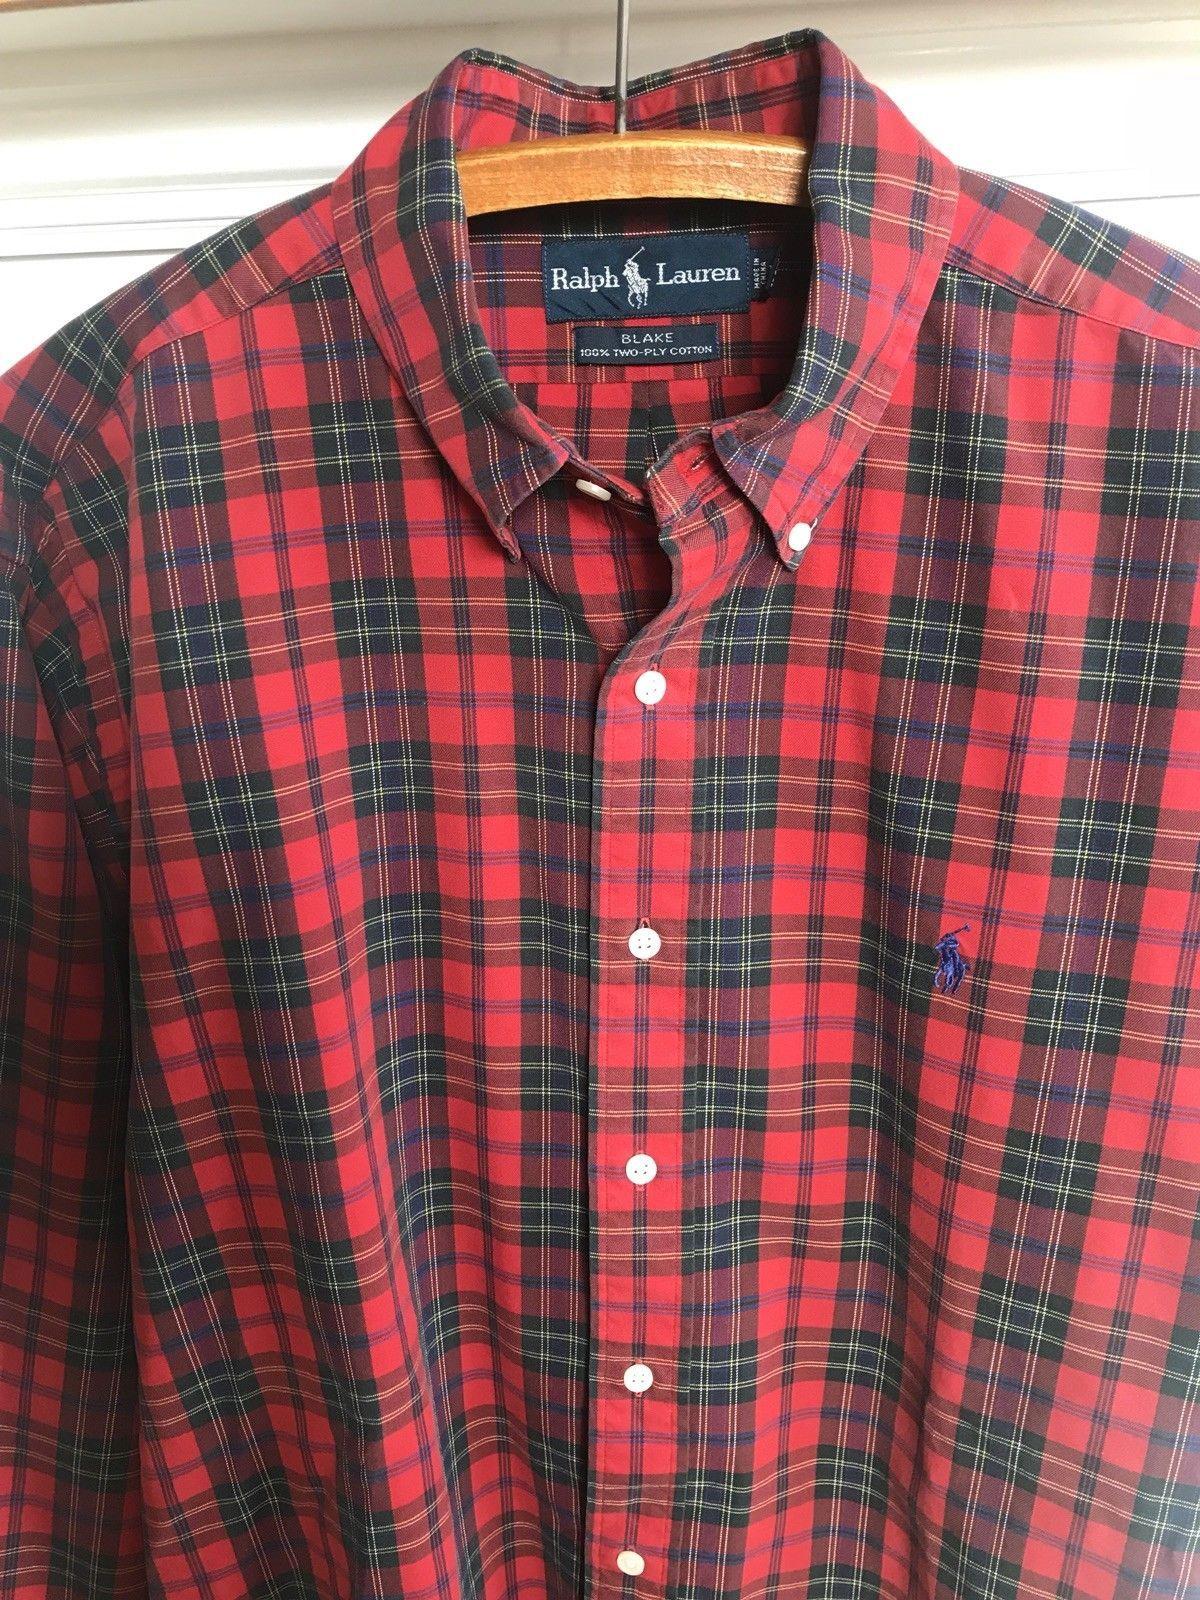 61cc0c440 Ralph Lauren Blake Shirt Sz Lg Red Black Tartan Plaid